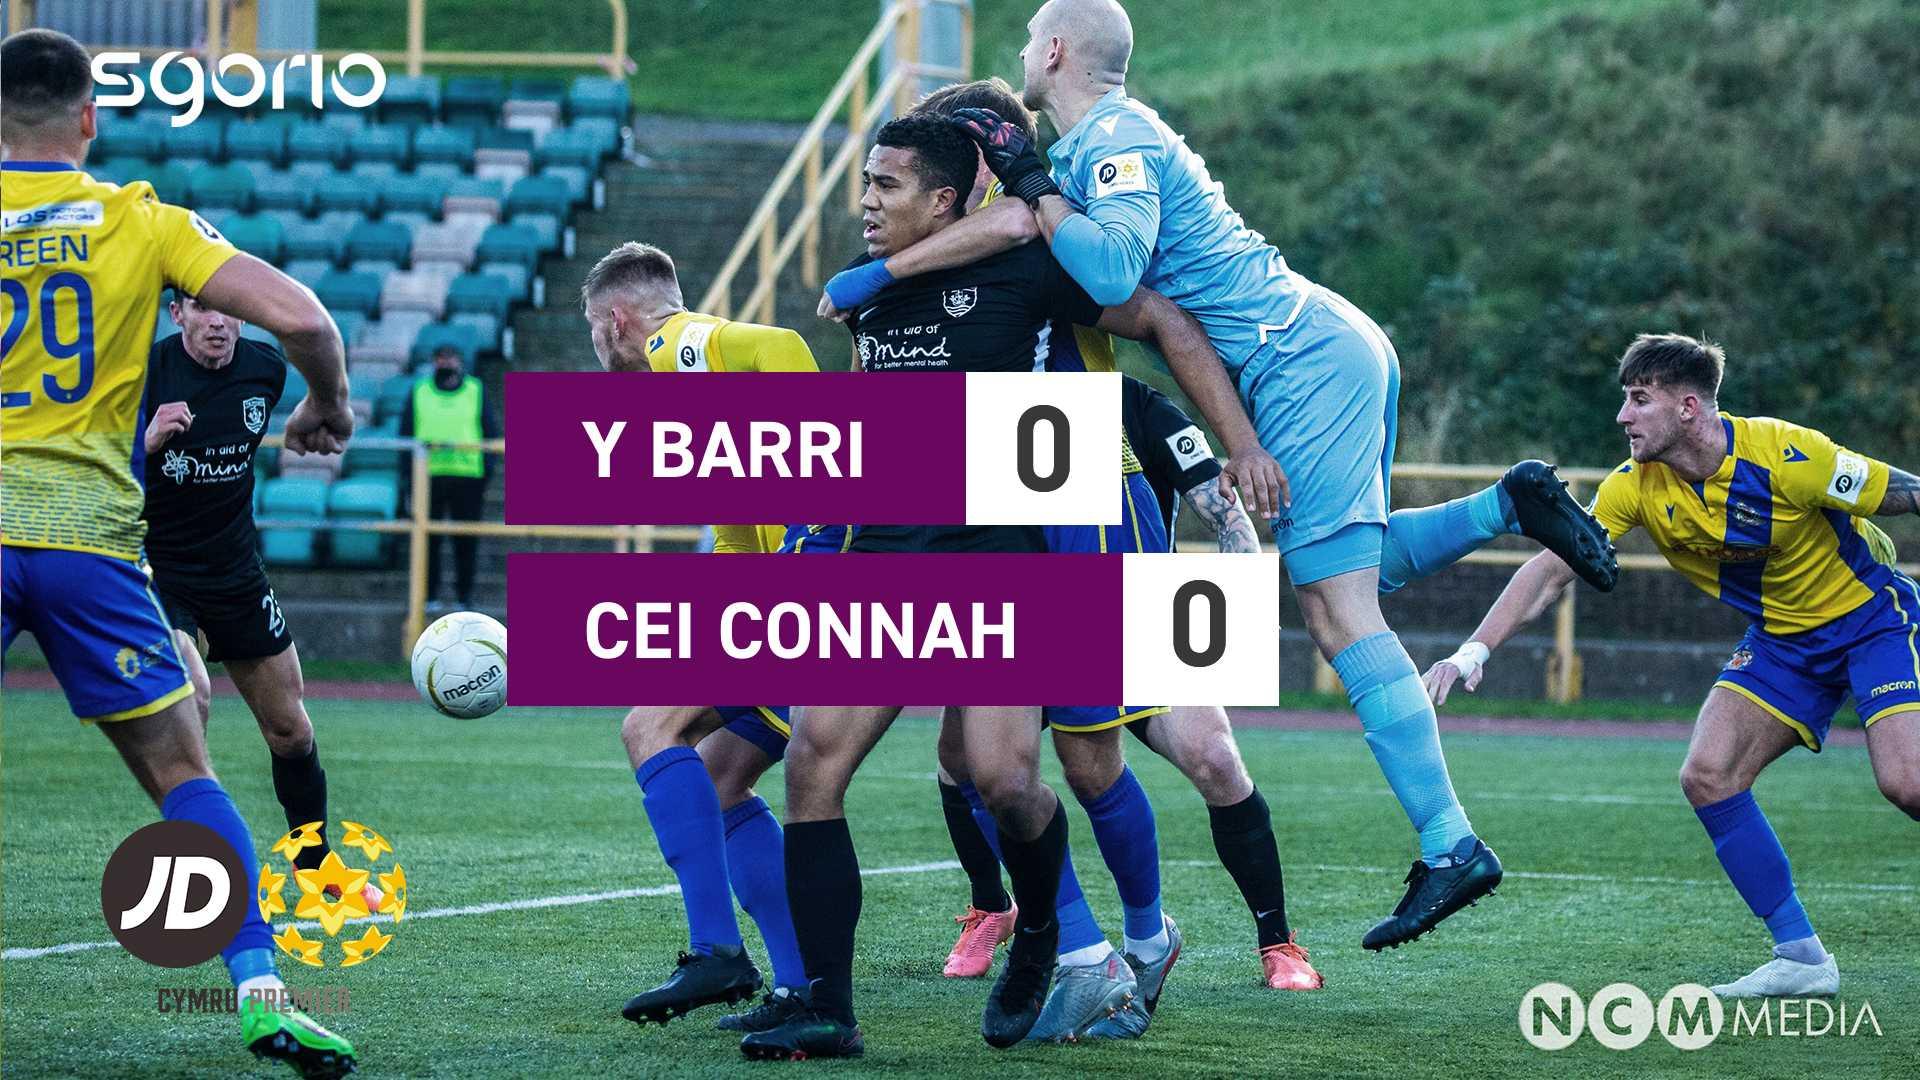 Y Barri 0-0 Cei Connah